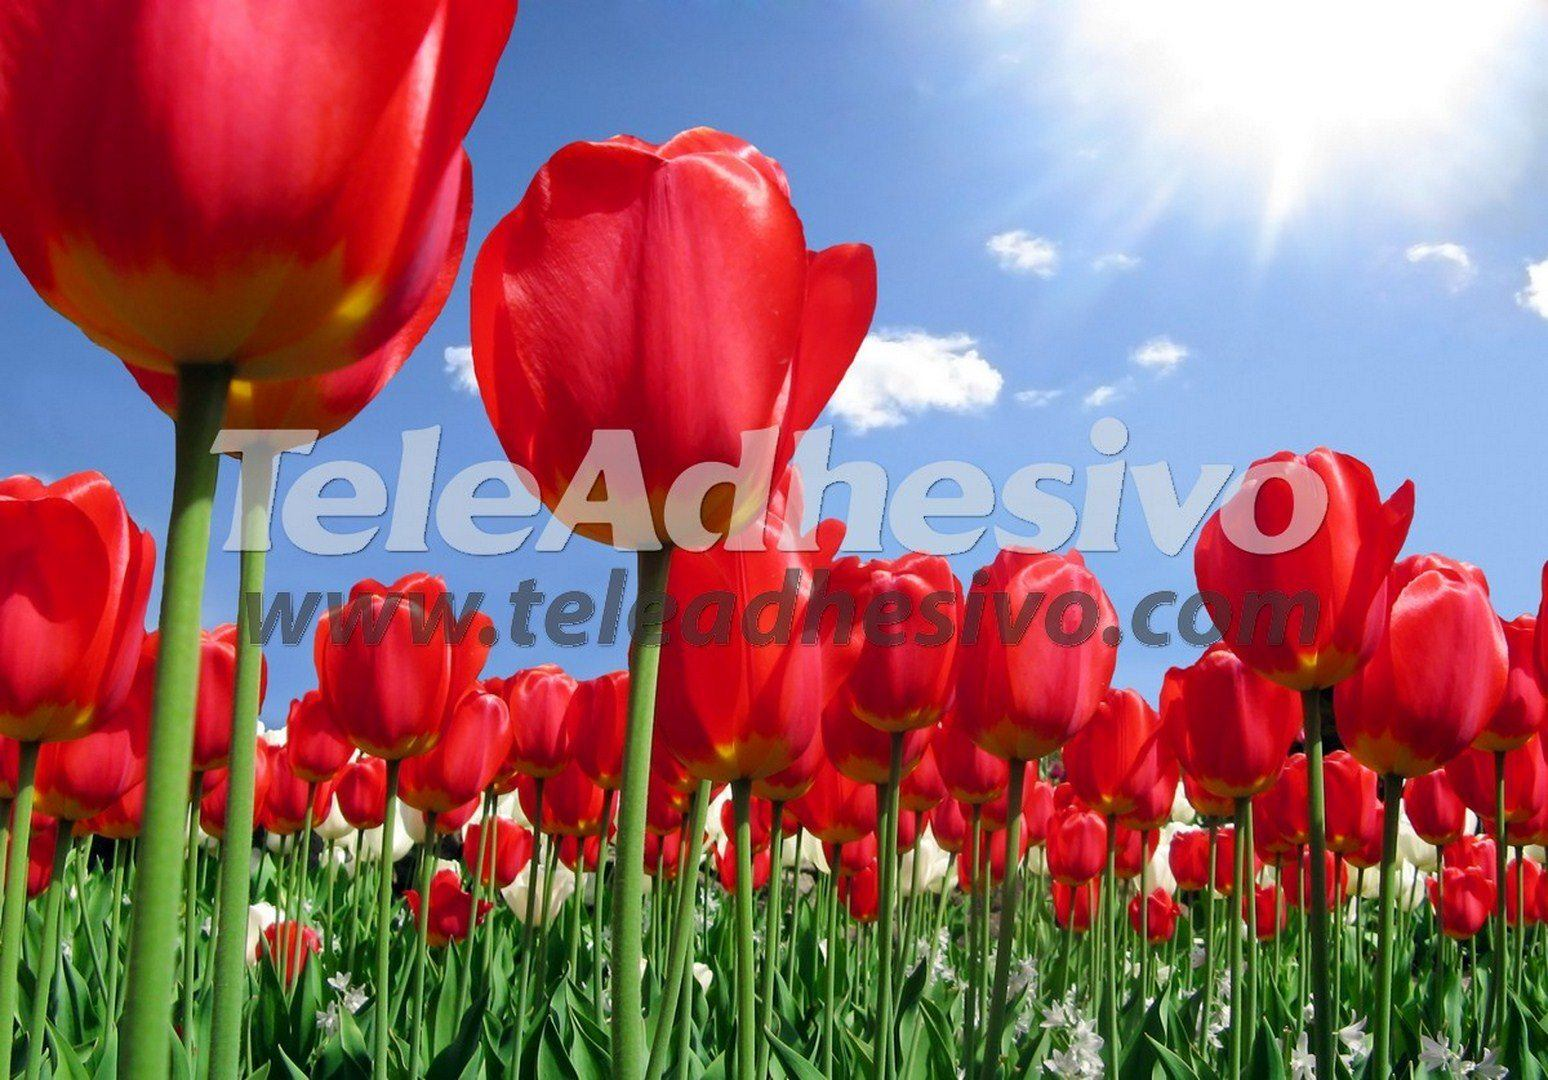 Fototapeten: Blumen 11